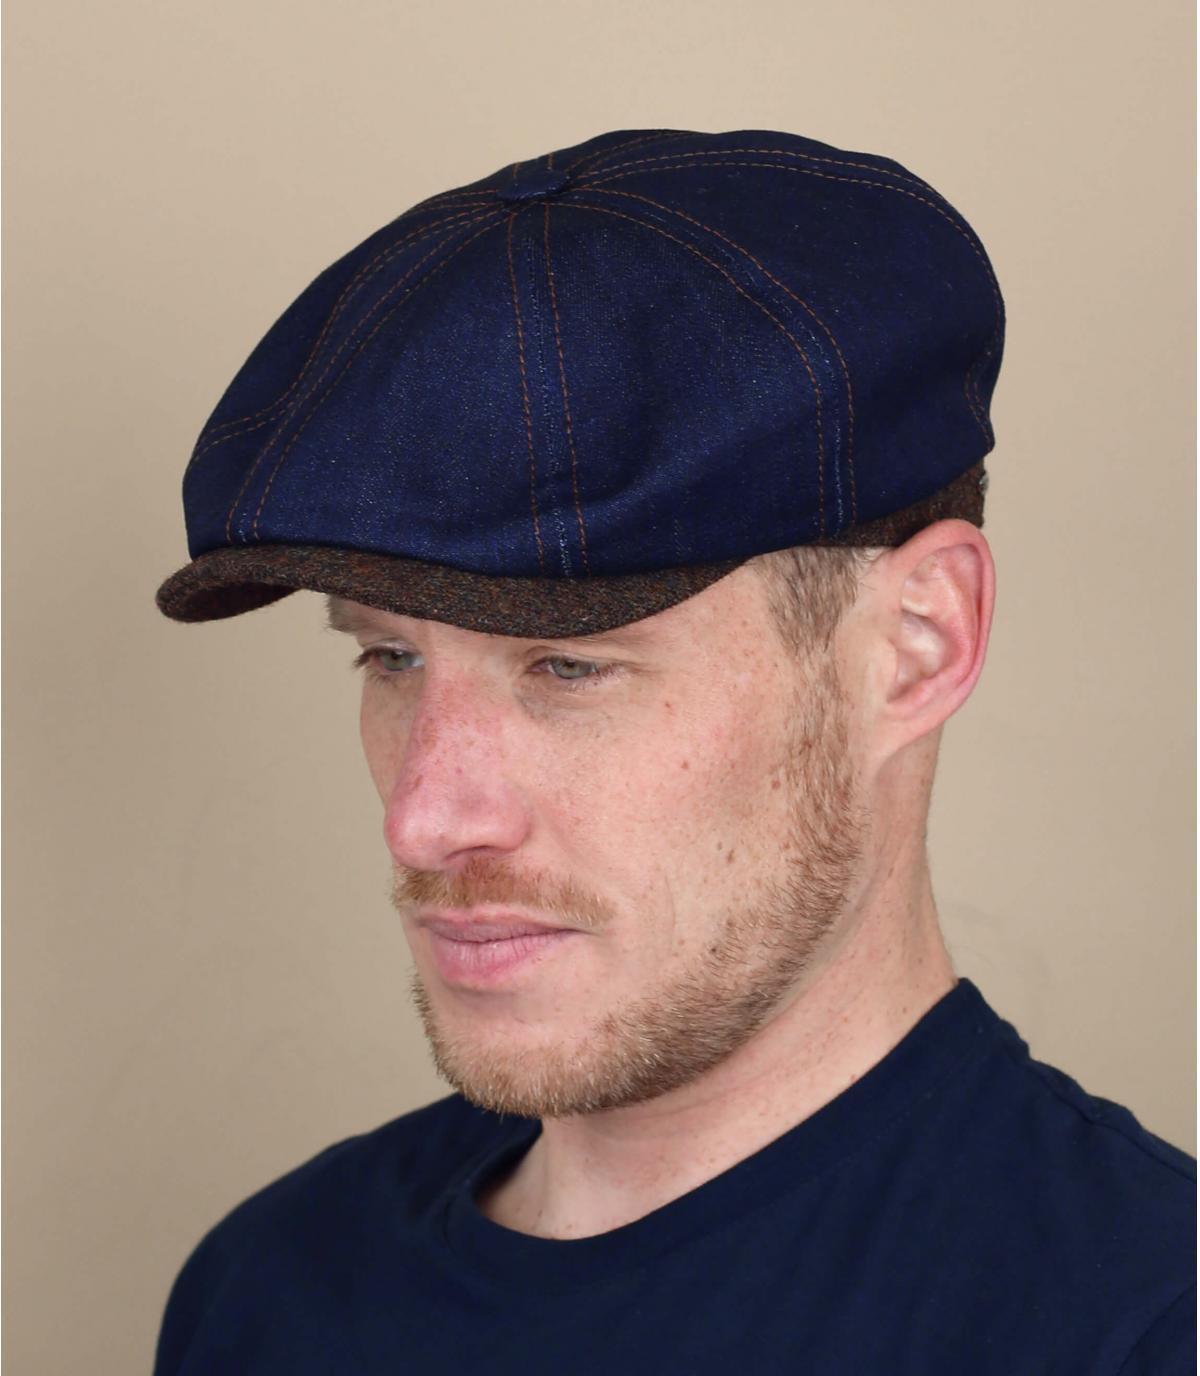 gorra repartidor azul denim